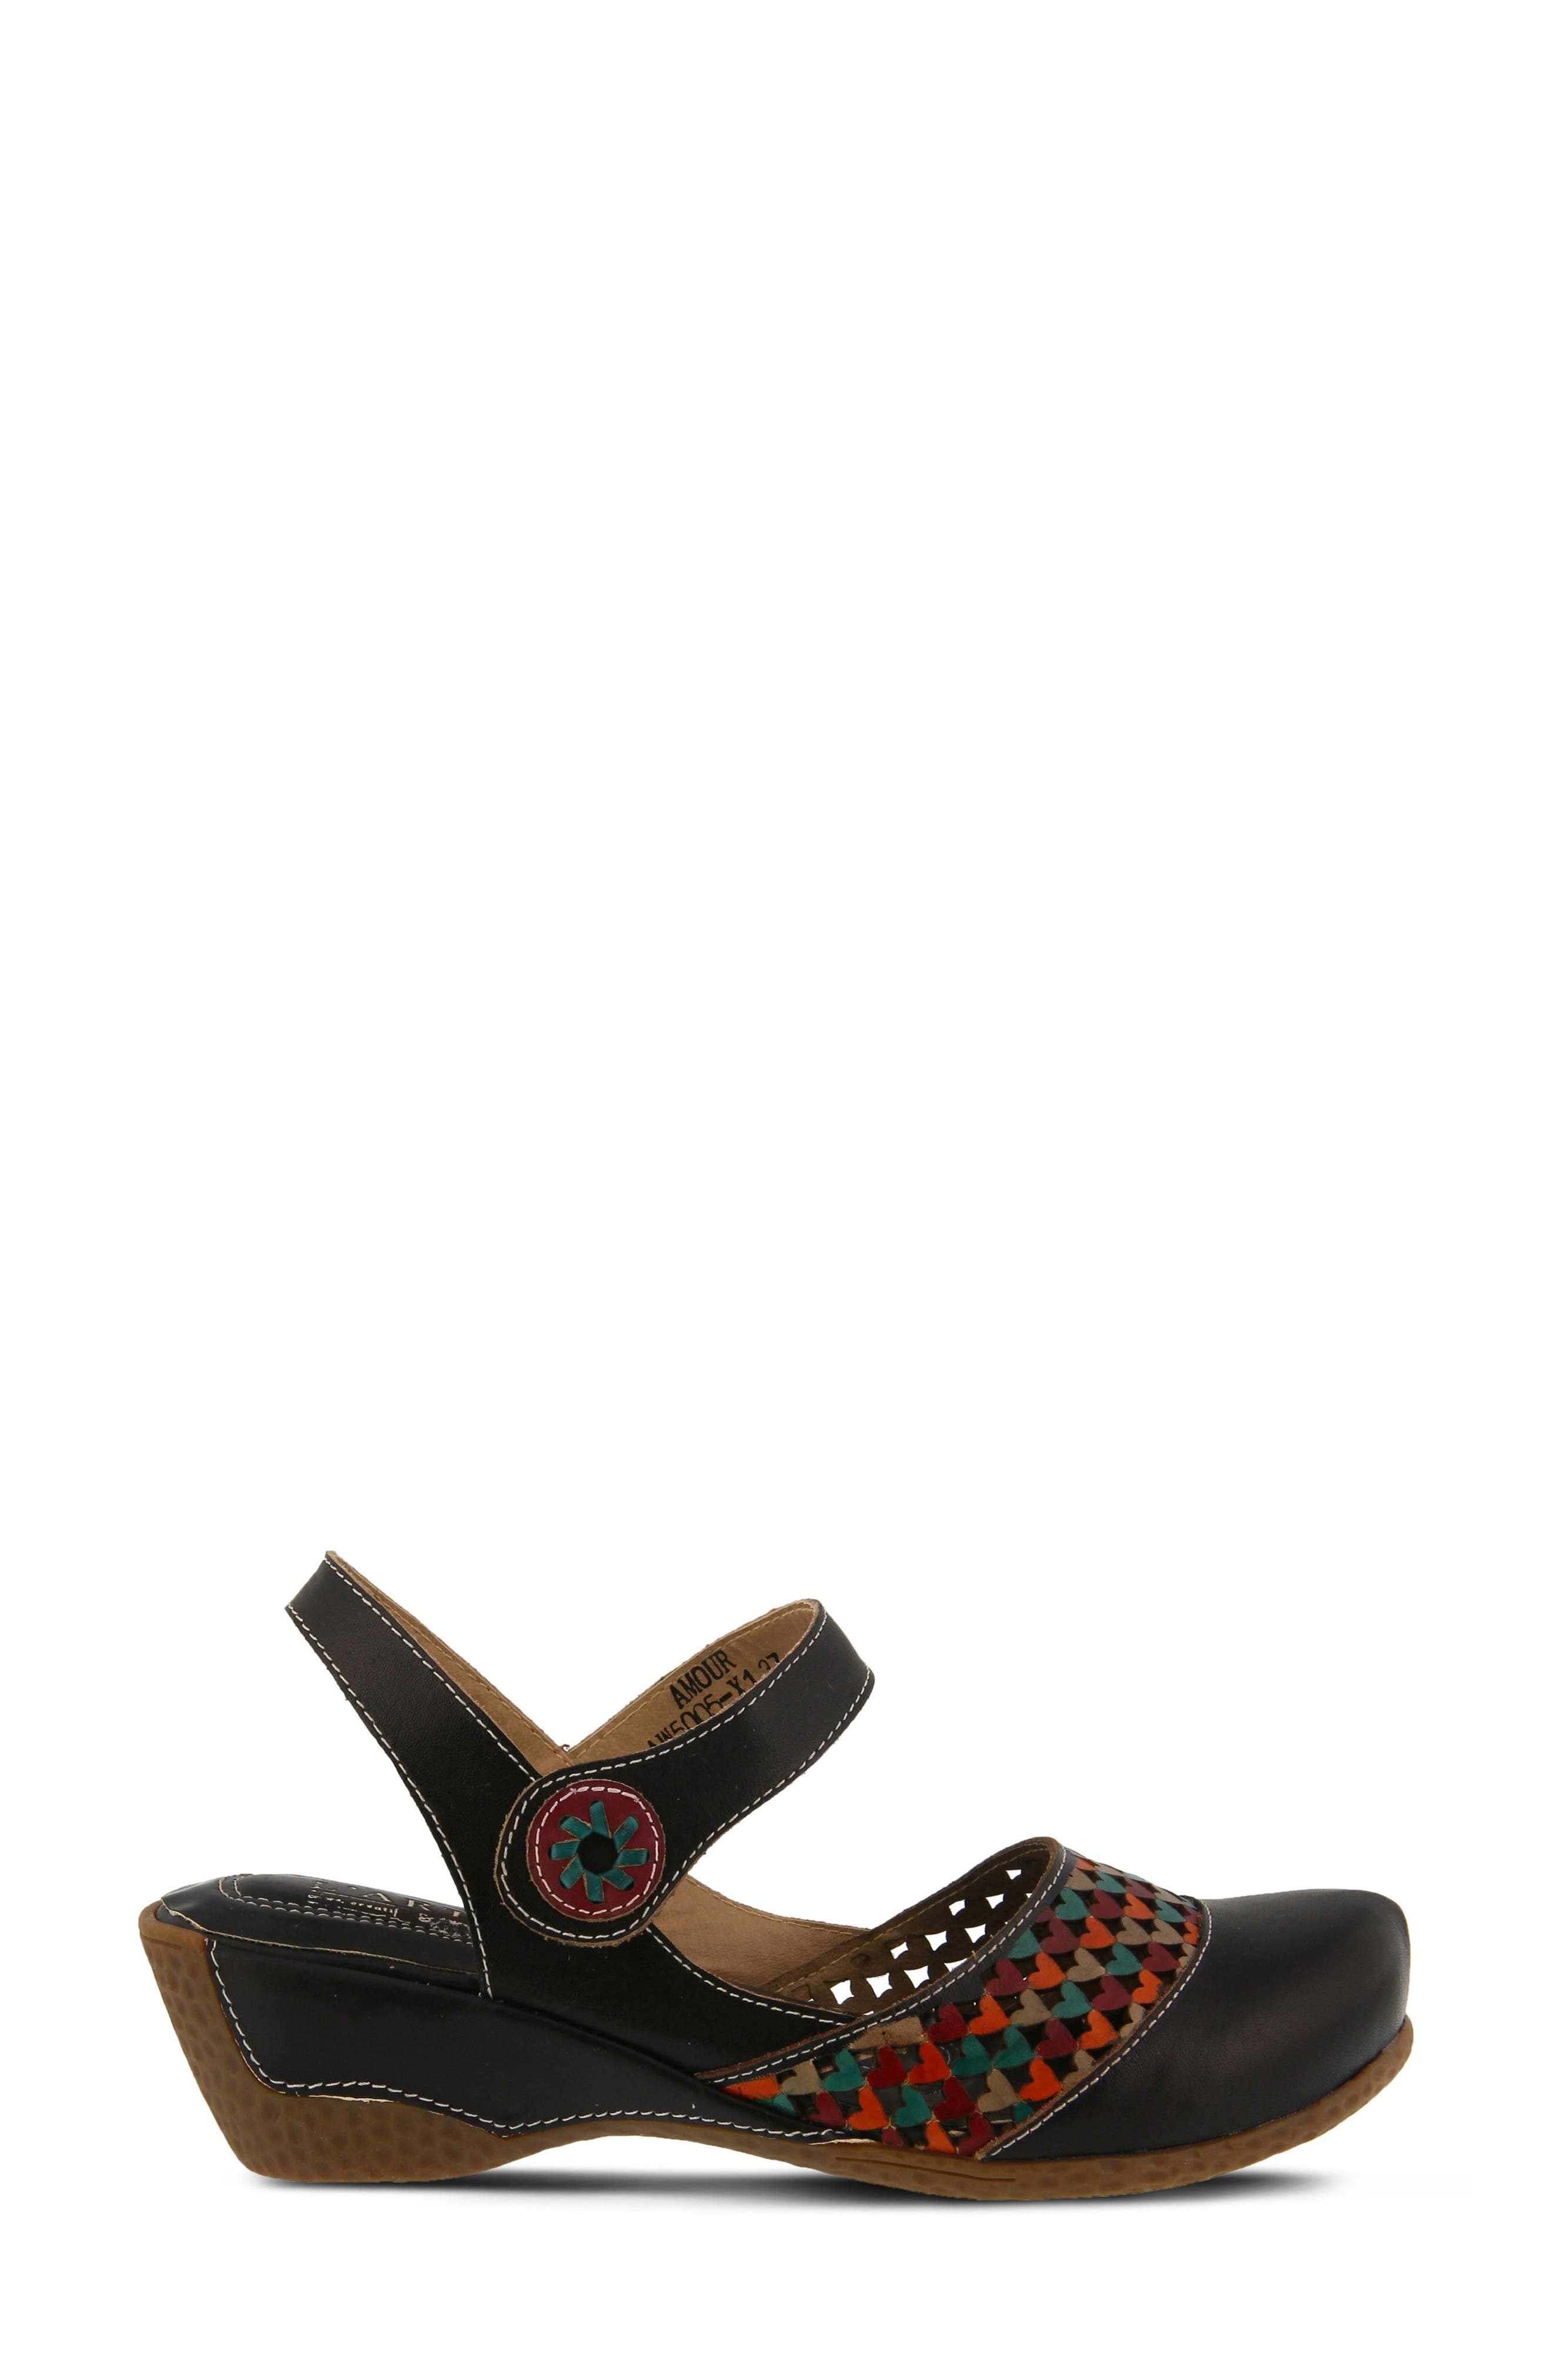 L'Artiste Amour Sandal,                             Alternate thumbnail 3, color,                             Black Leather